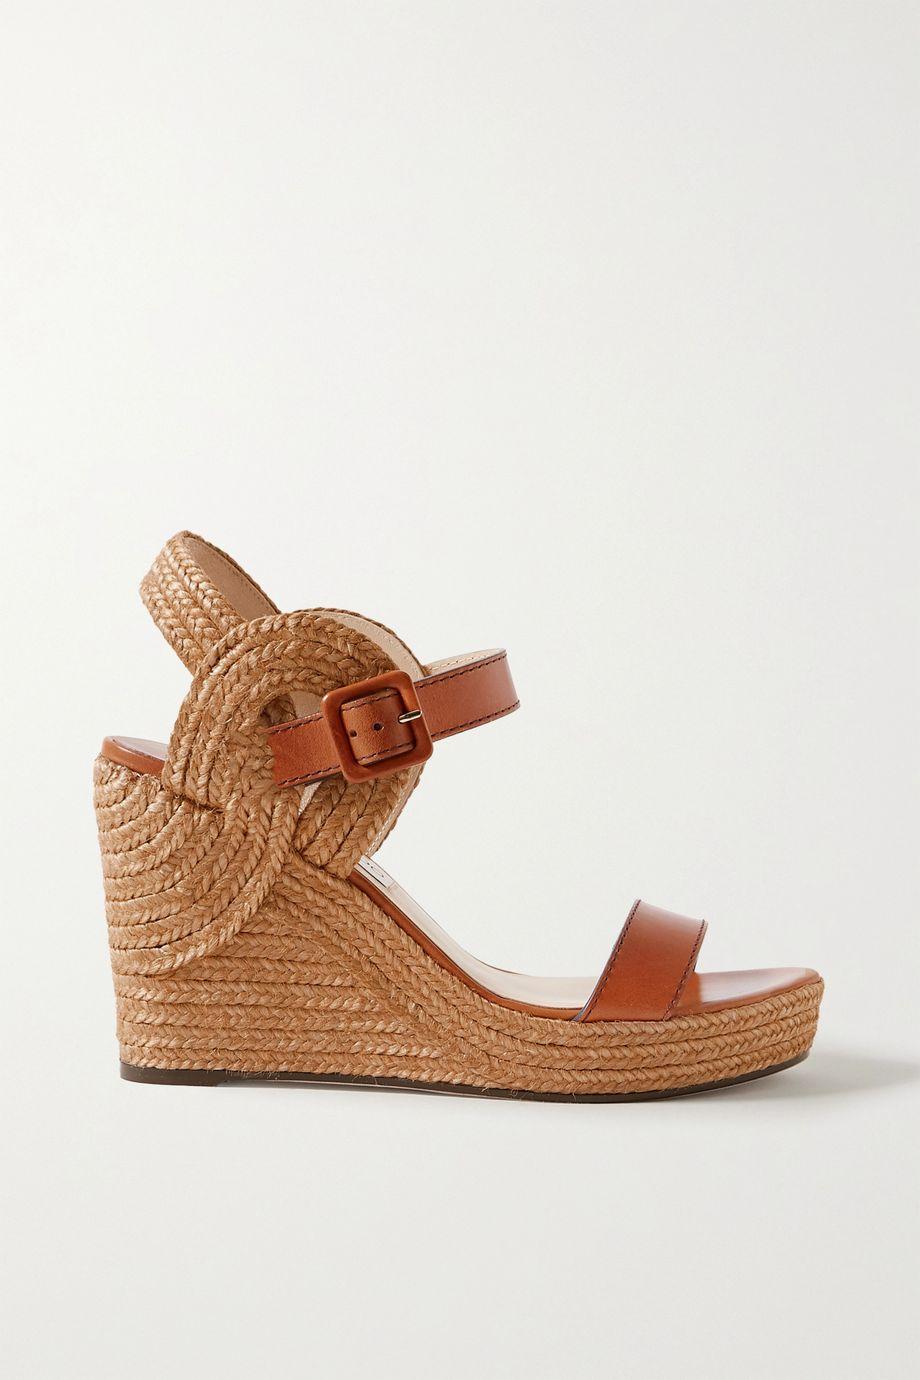 Jimmy Choo Delphi 100 皮革黄麻坡跟麻底凉鞋